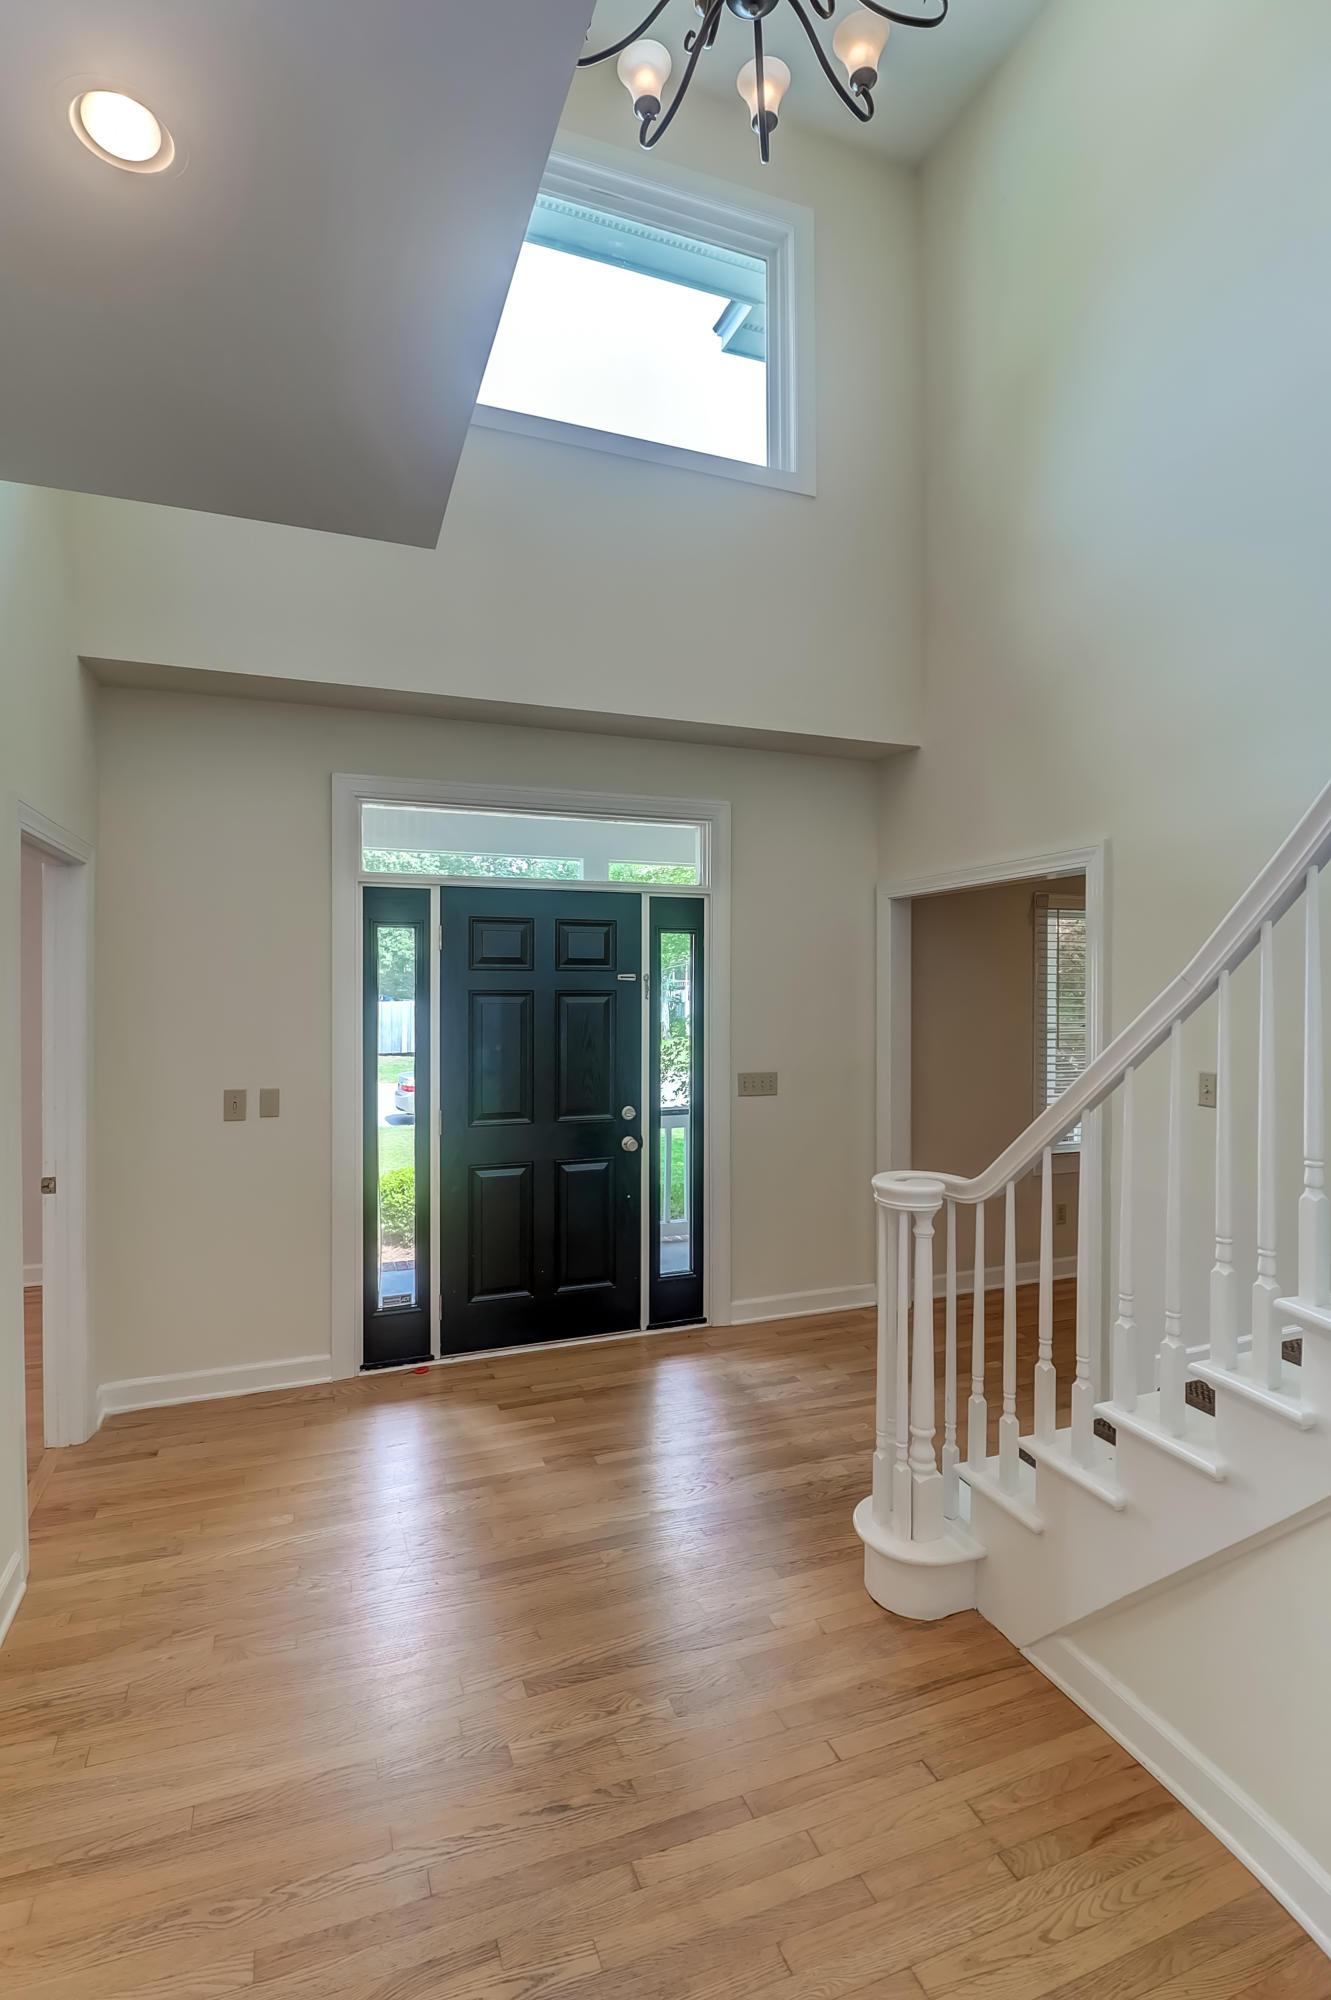 Parrot Creek Homes For Sale - 879 Parrot Creek, Charleston, SC - 40